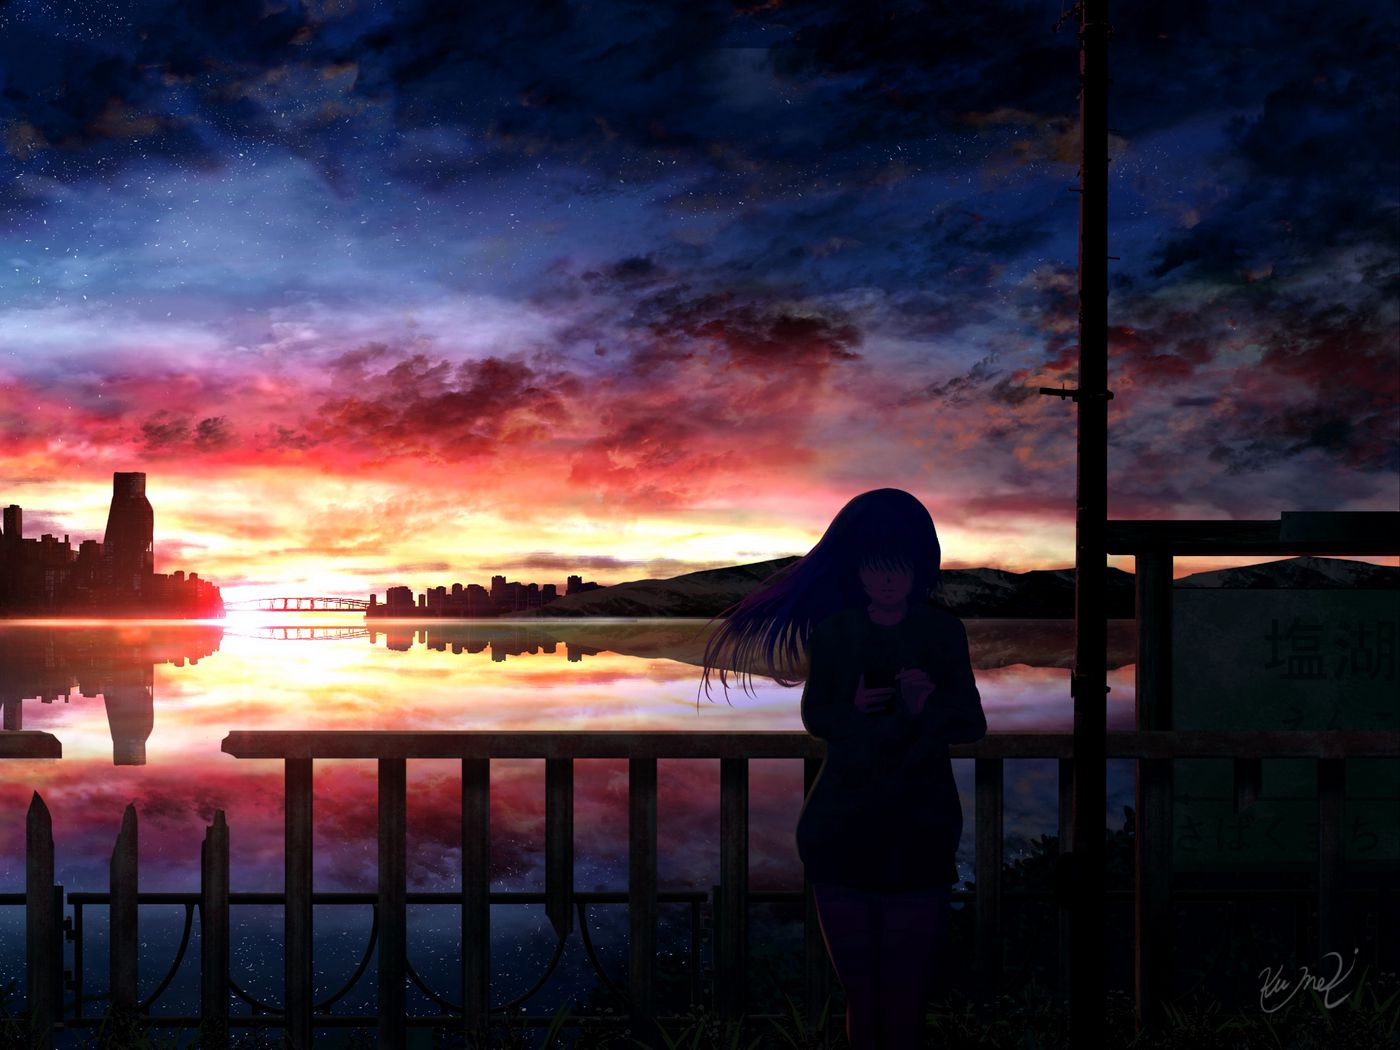 1400x1050 Wallpaper silhouette, night, starry sky, girl, anime